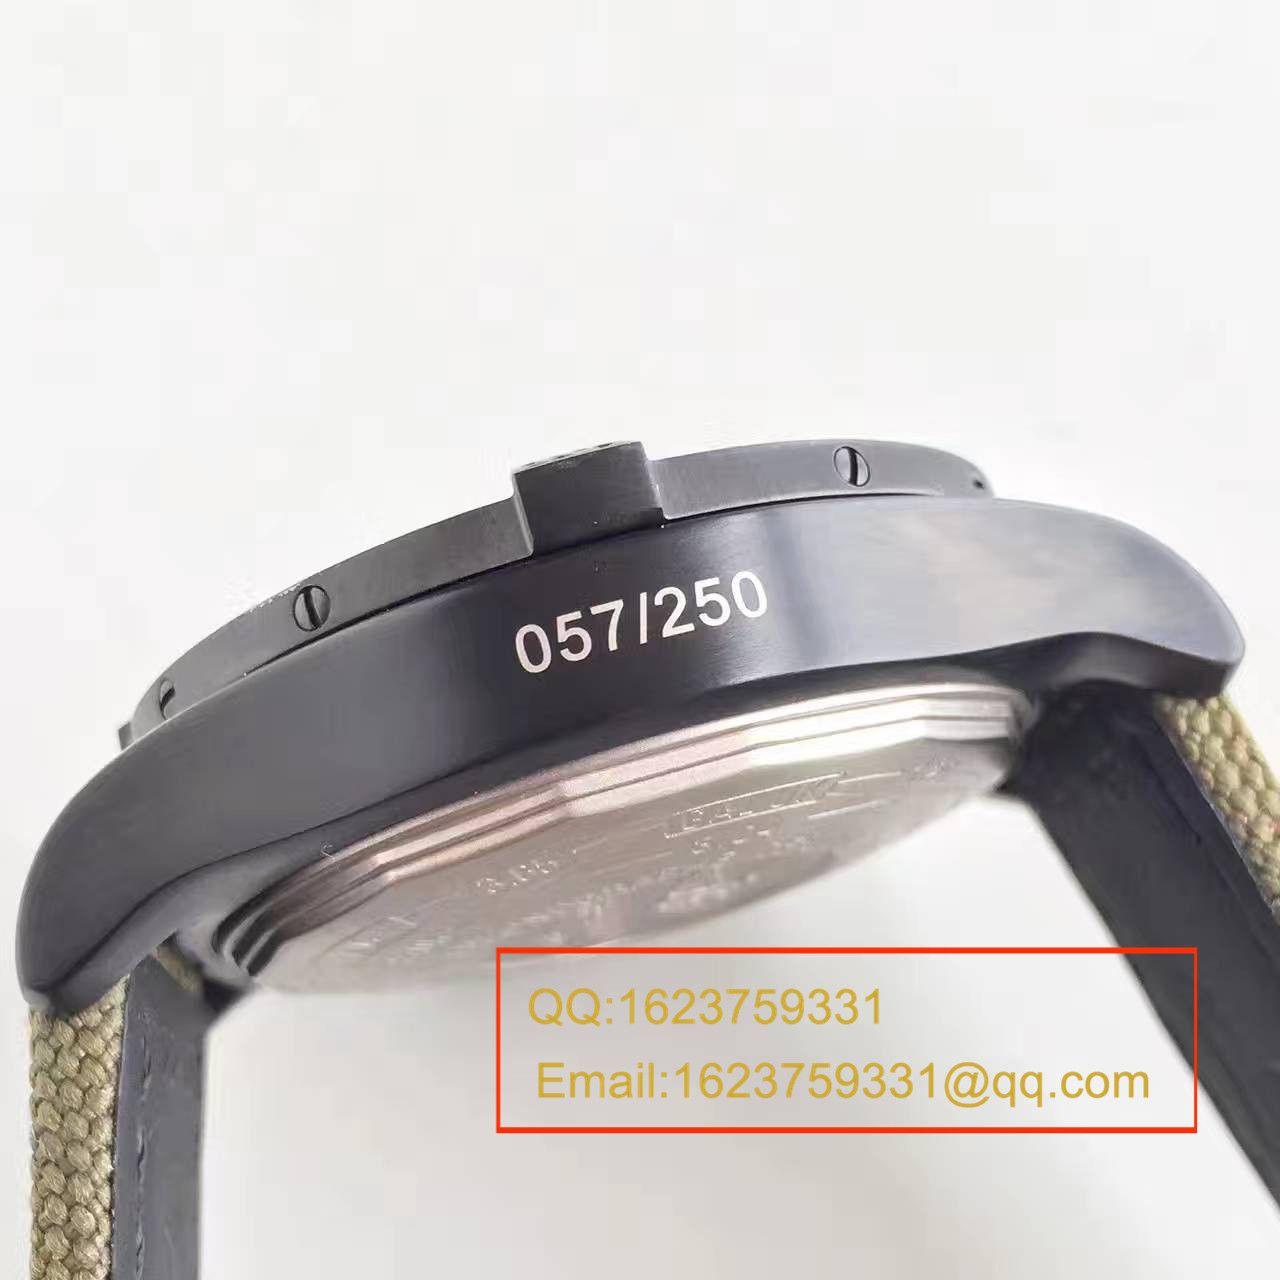 【GF1:1超A精仿手表】百年灵美军专用定制版复仇者Breitling USA military avenger II carbon fiber / BL012